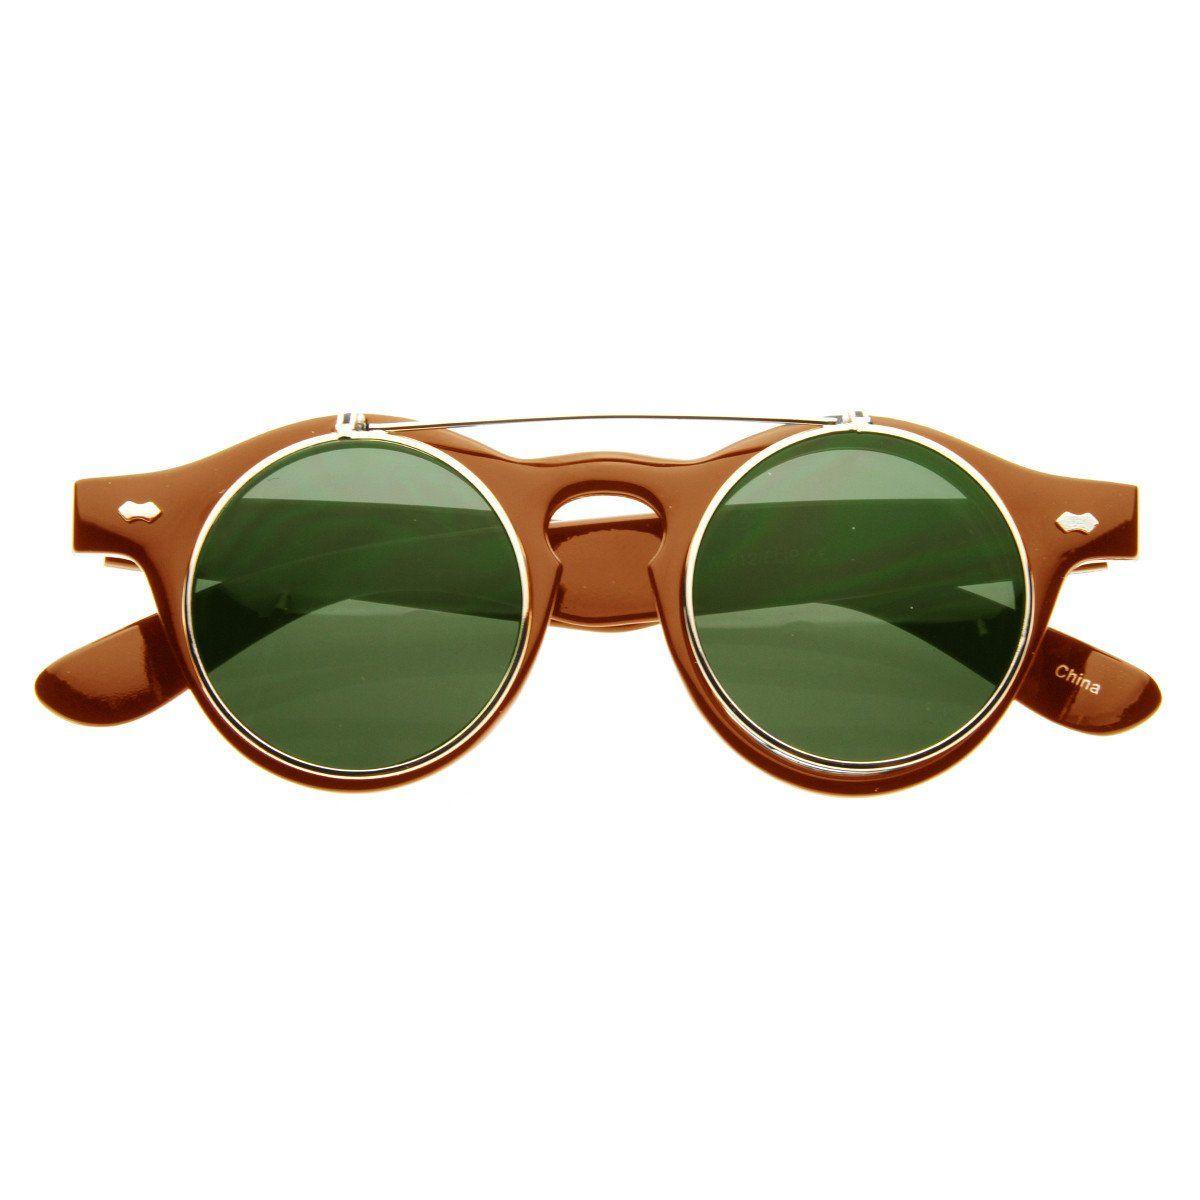 e00fbbe711f3a Small Retro Steampunk Circle Flip Up Glasses   Sunglasses Cabides, Lentes  Redondas, Óculos,